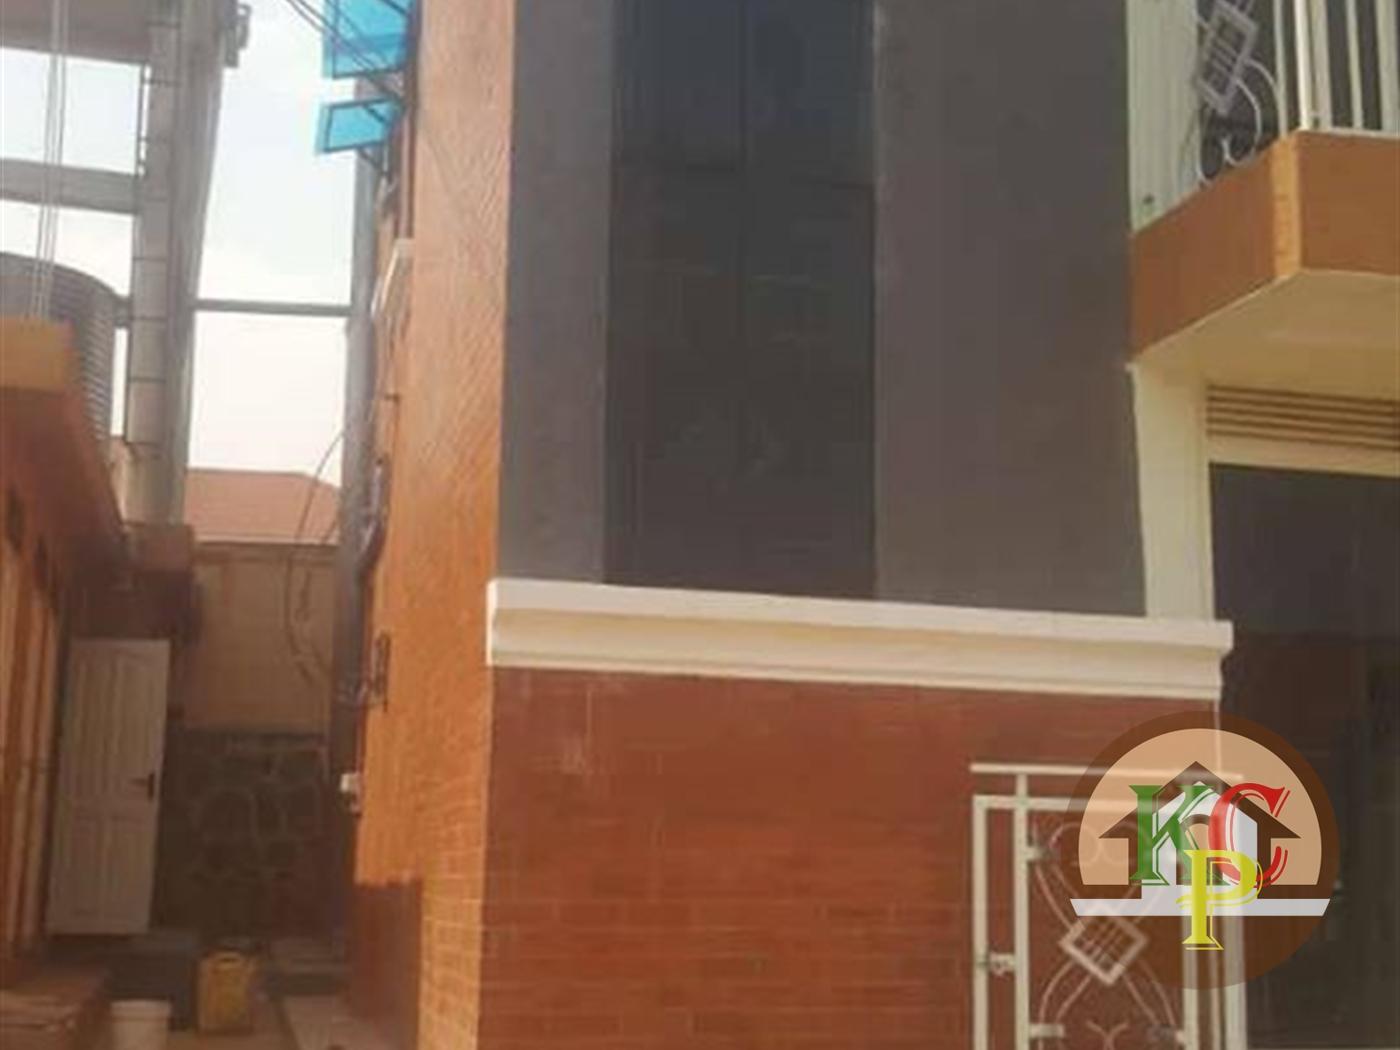 Apartment for rent in Bwebajja Wakiso